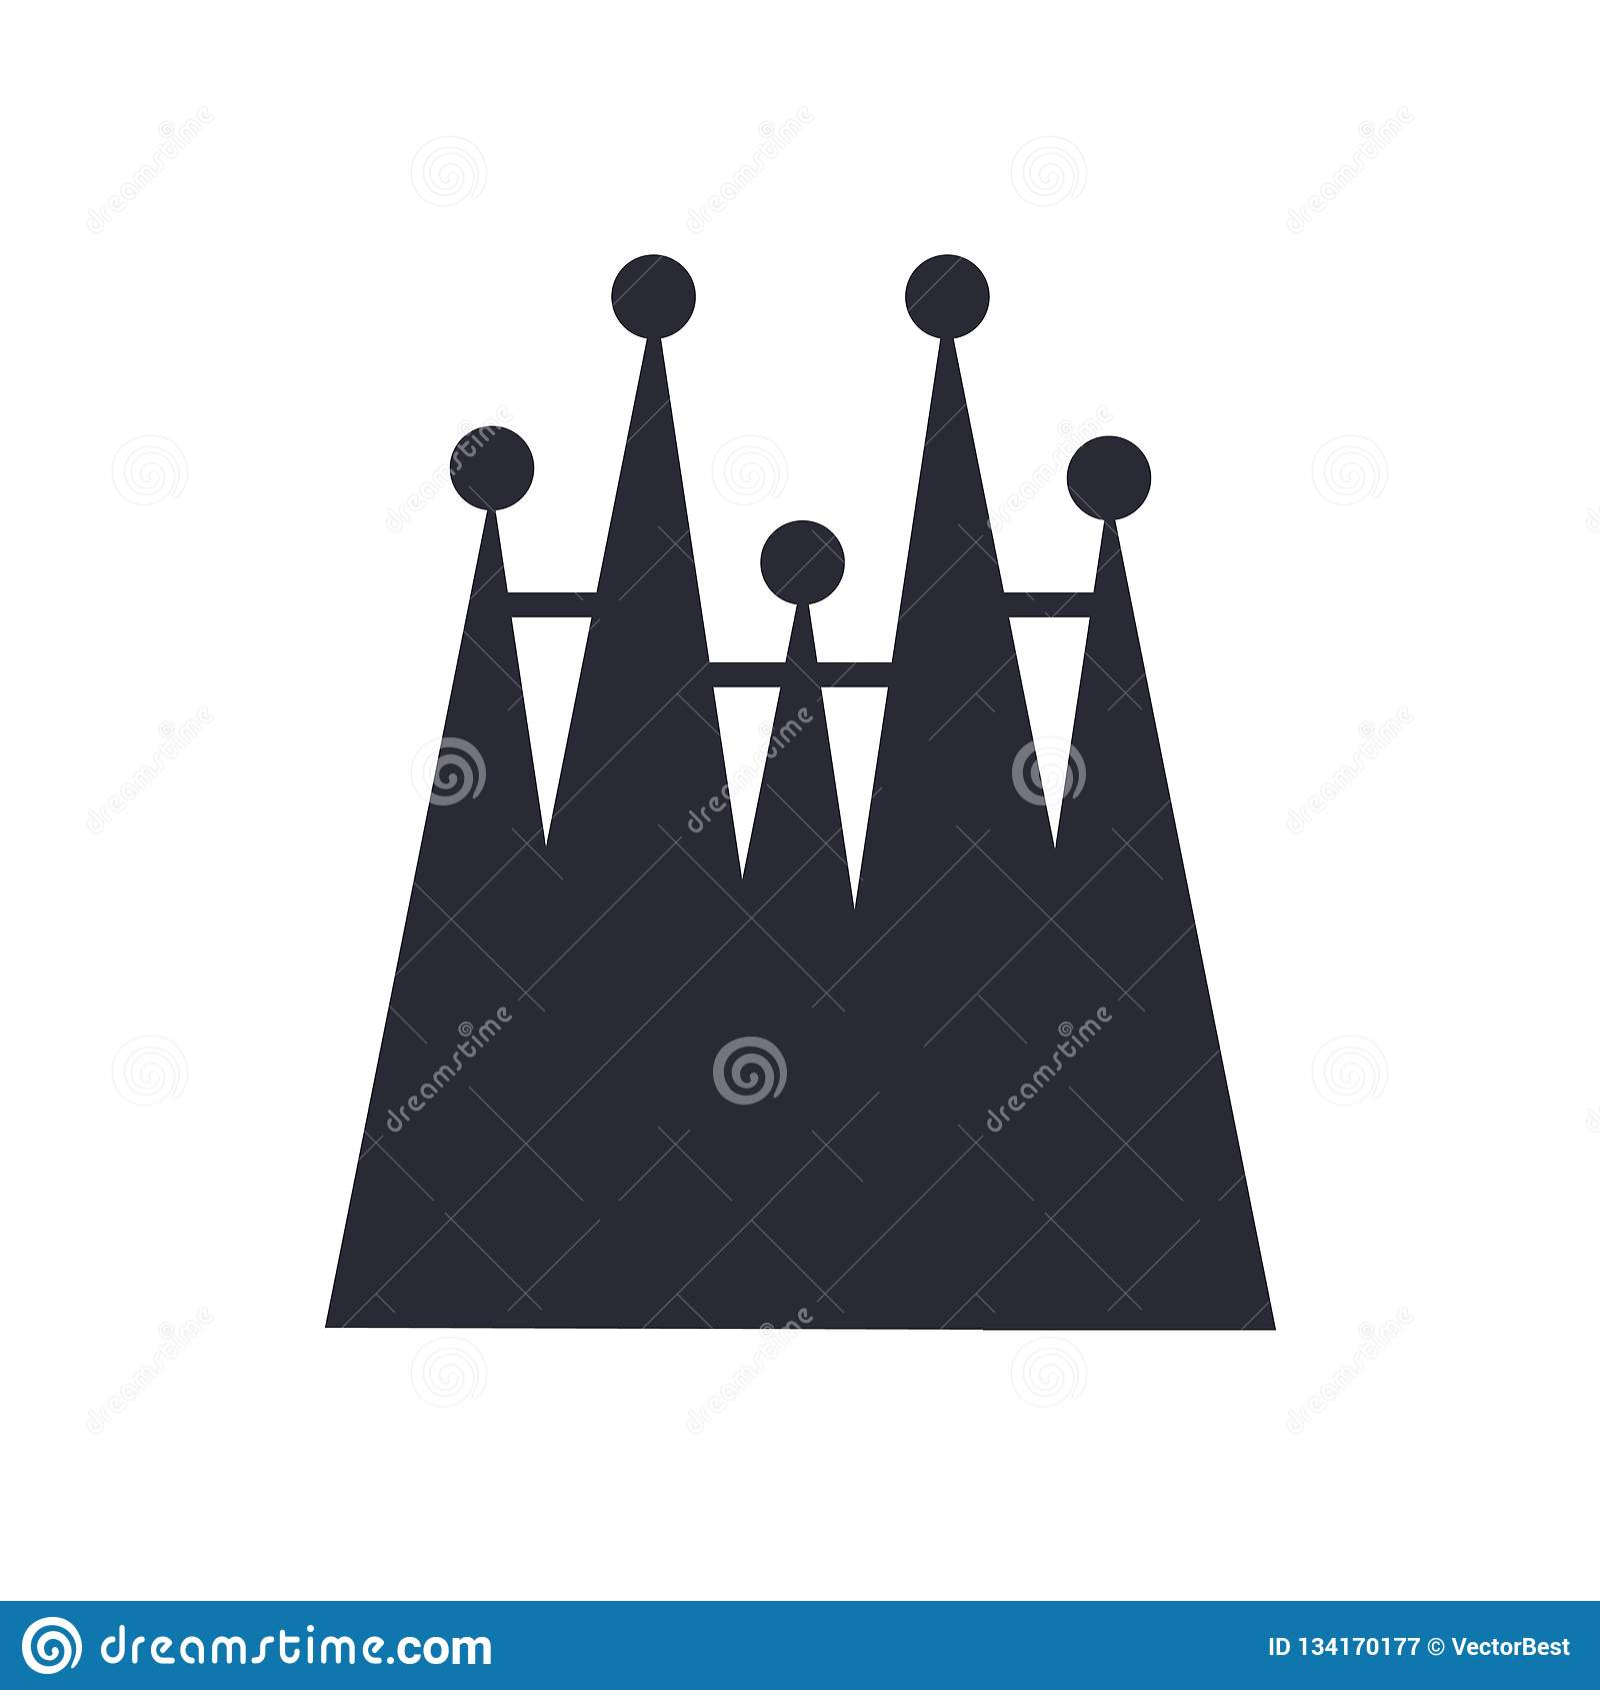 Sagrada Familia building icon sign and symbol isolated on white background, Sagrada Familia building logo concept